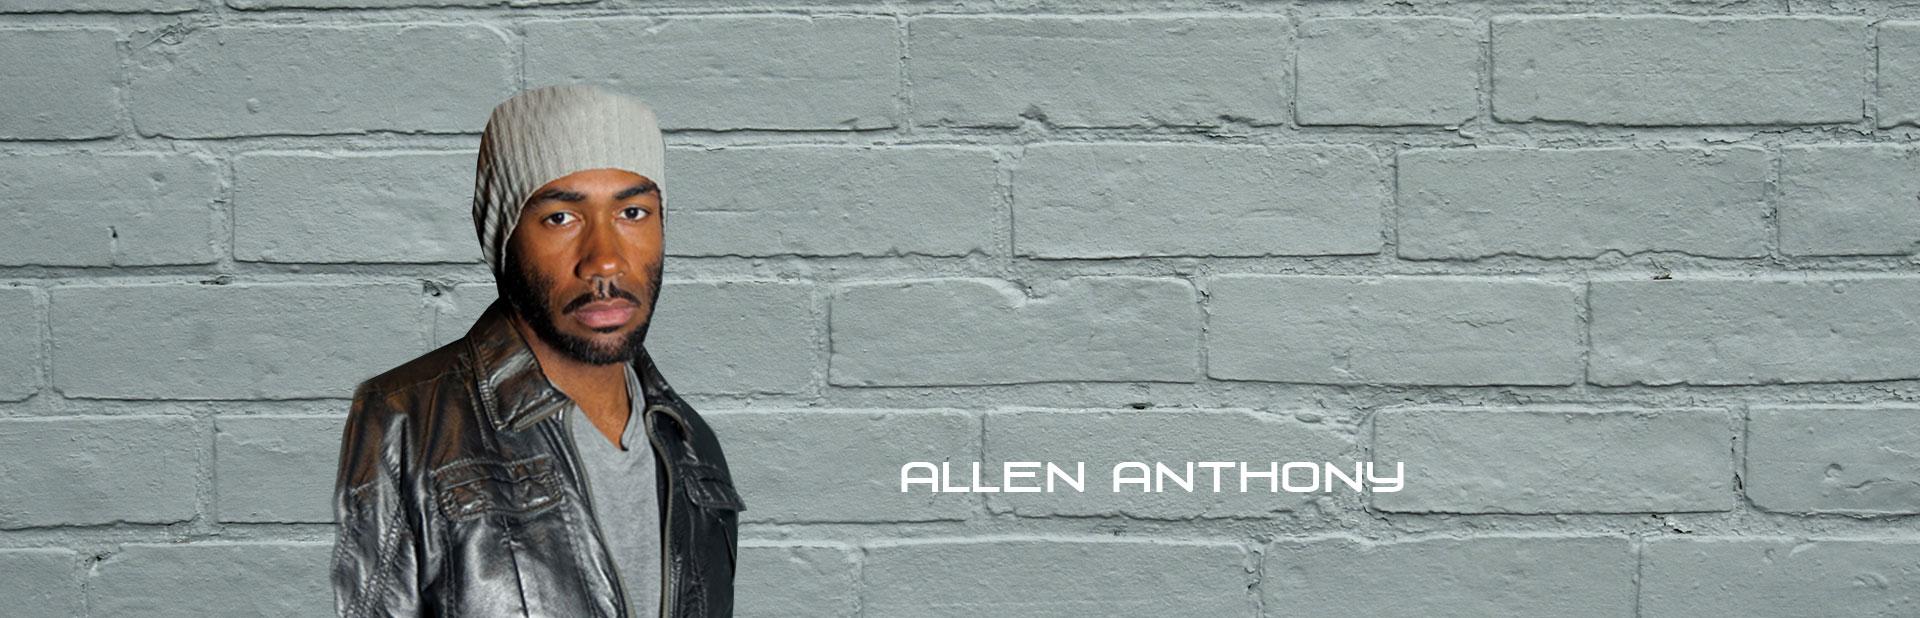 Allen Anthony1